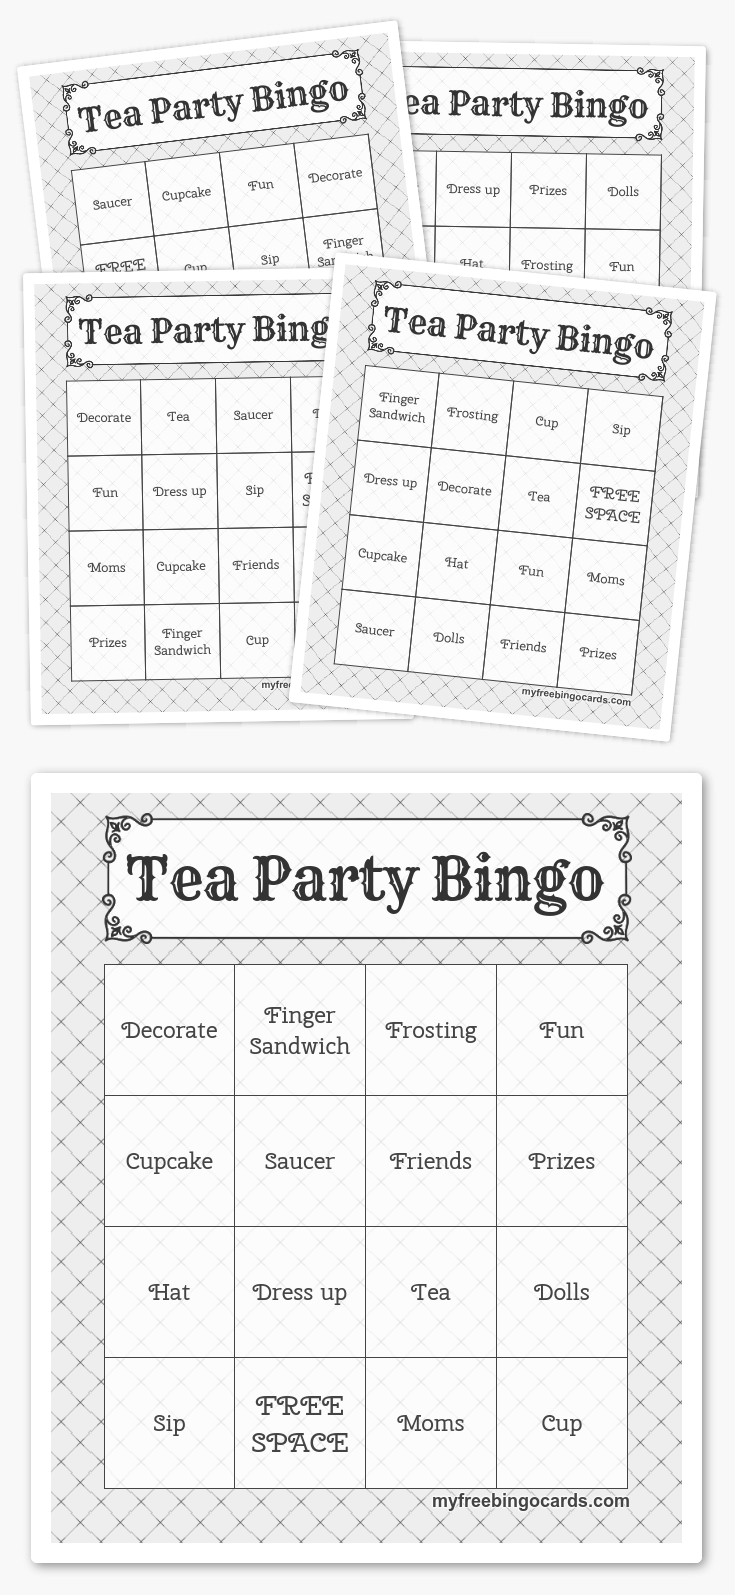 Free Printable Bingo Cards In 2019 | Printables | Pinterest | Harry - Free Printable Bingo Cards Random Numbers